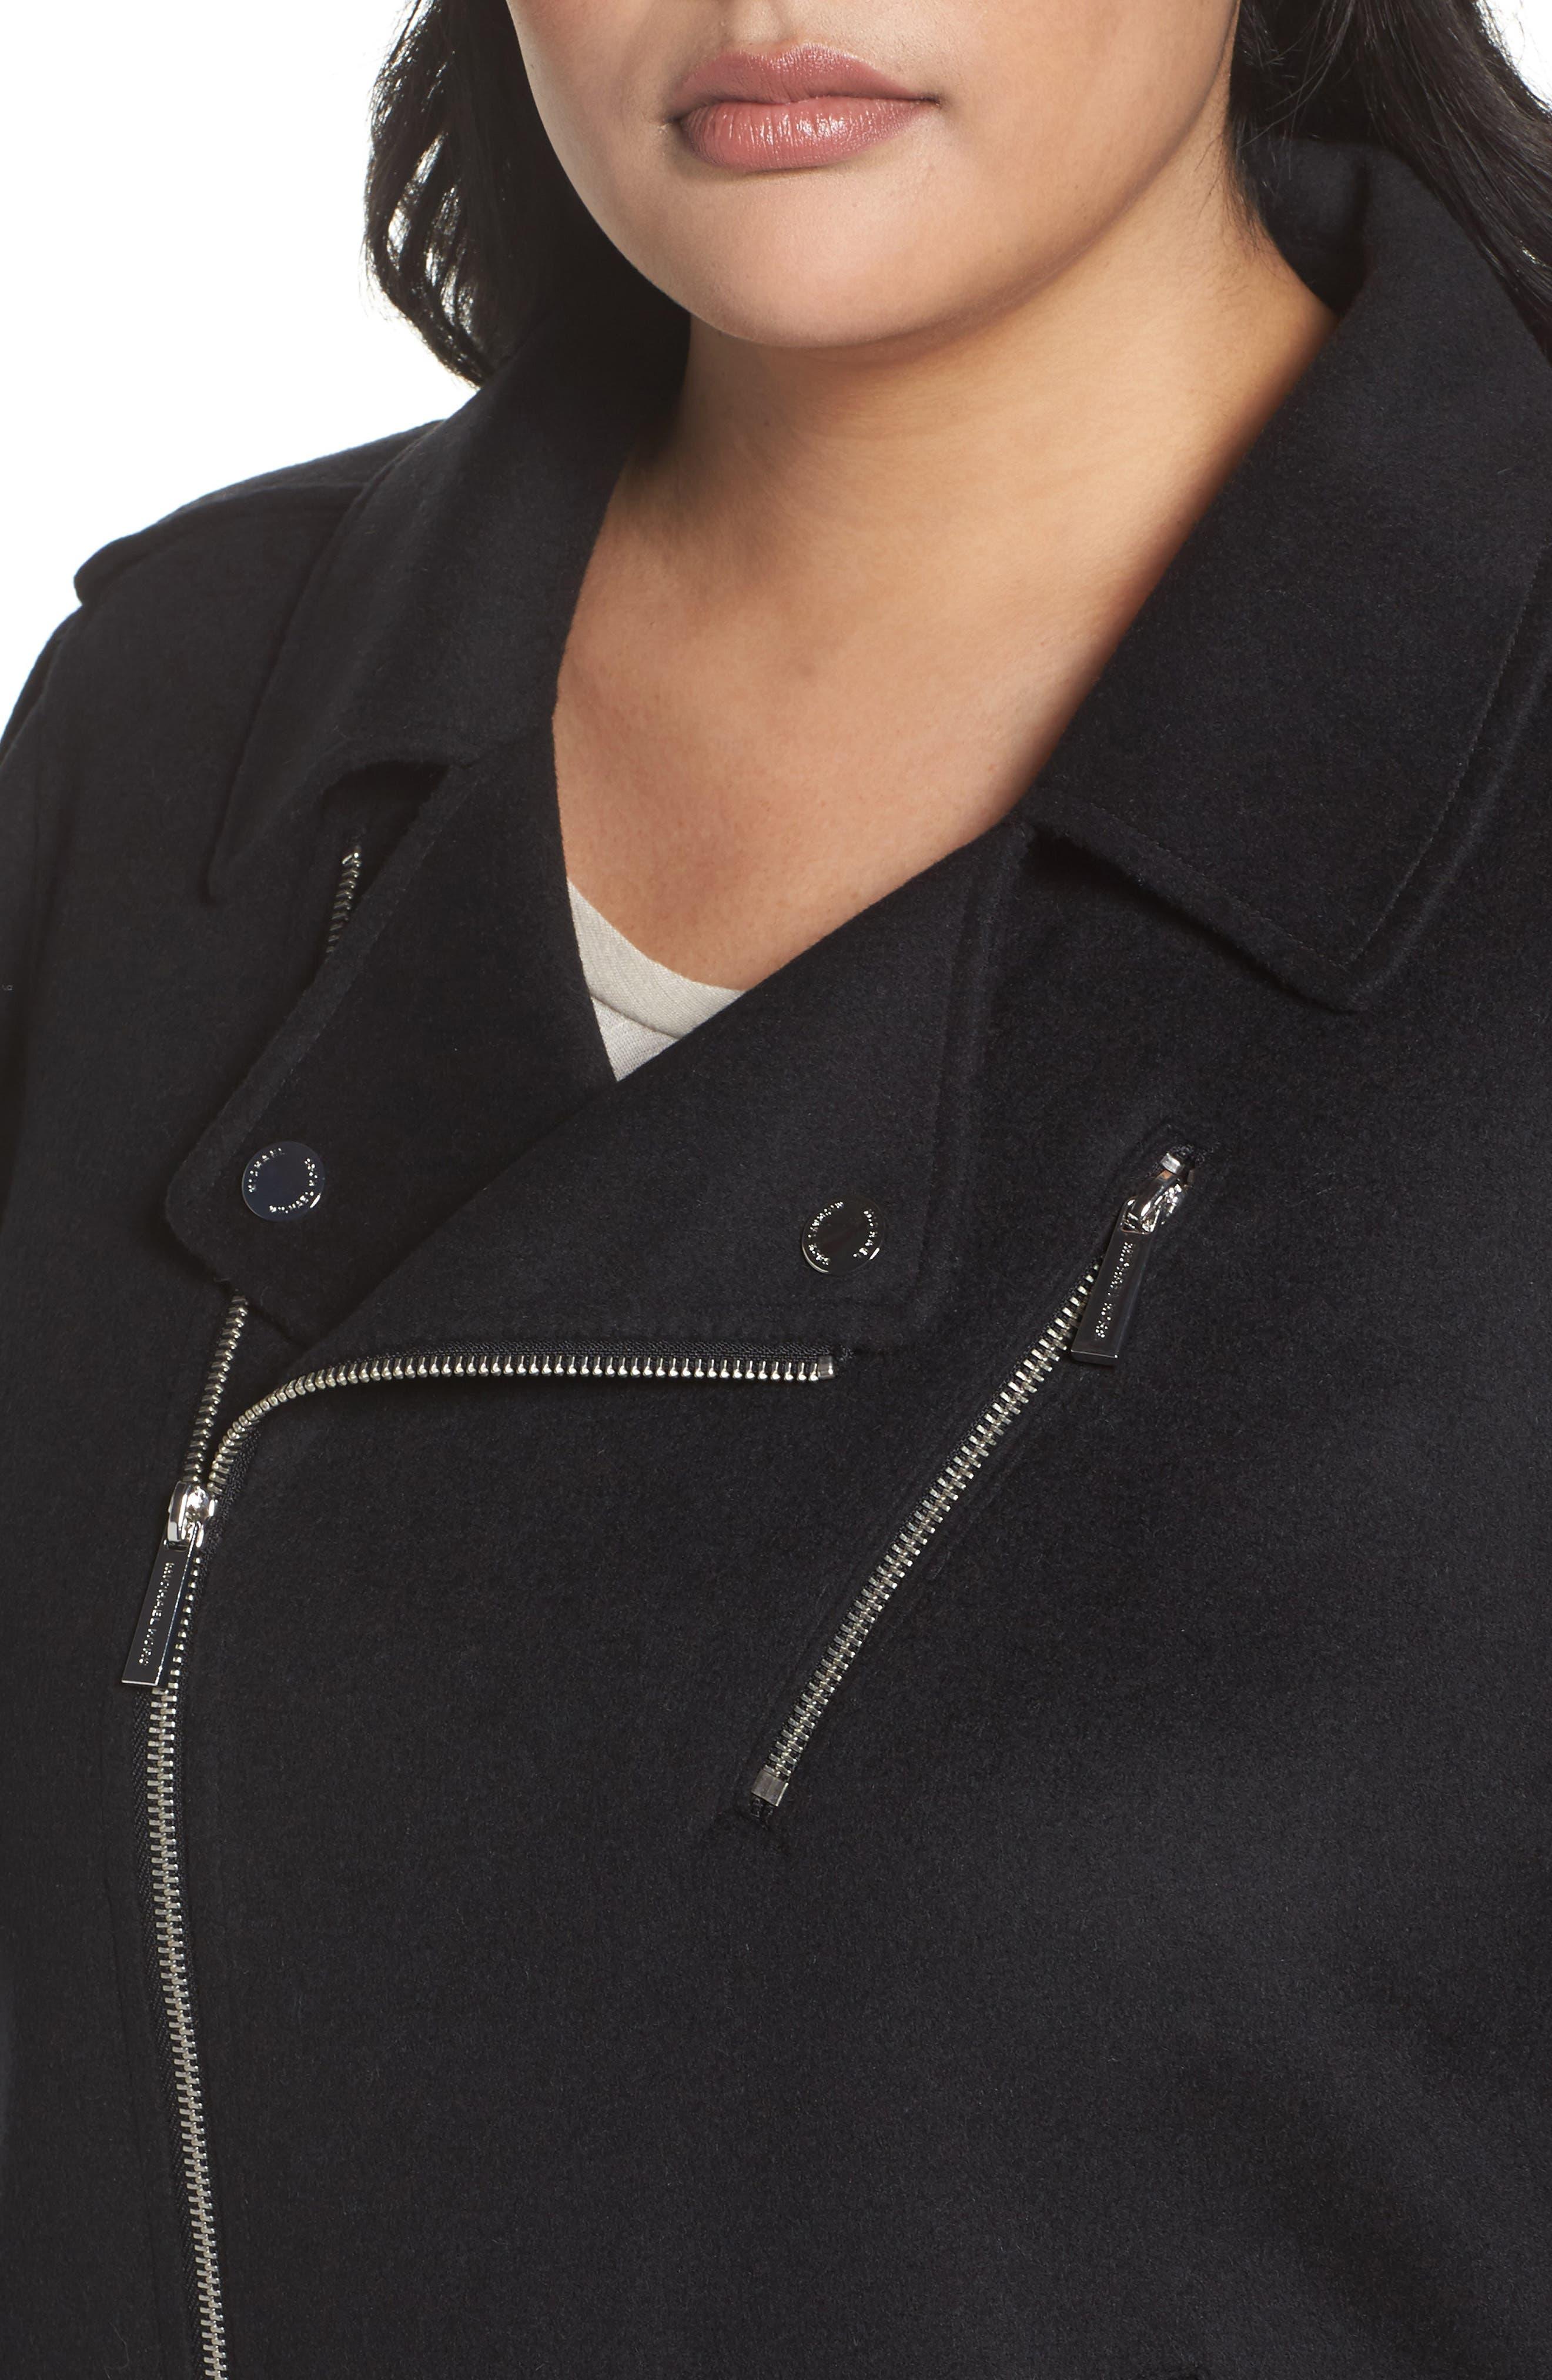 Wool Blend Moto Jacket,                             Alternate thumbnail 4, color,                             Black